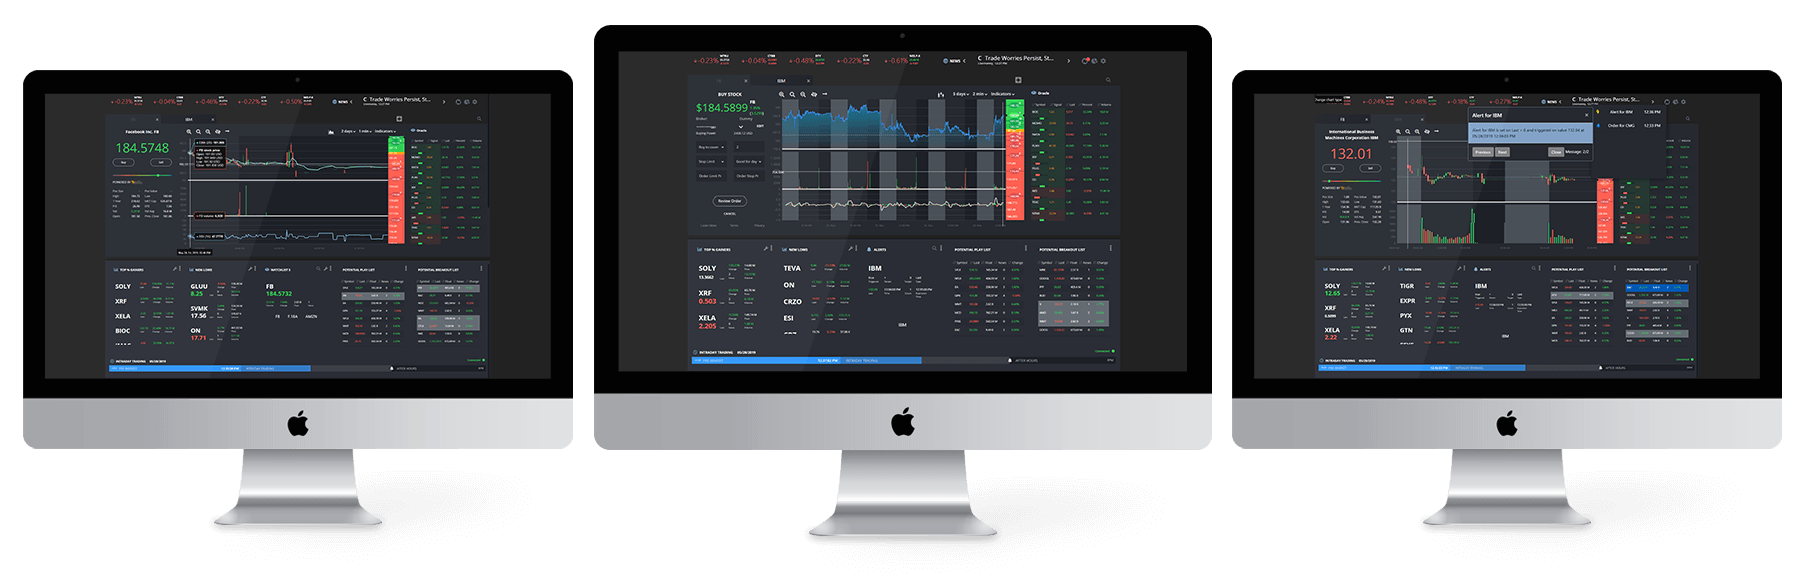 StockToTradeWebApp solution